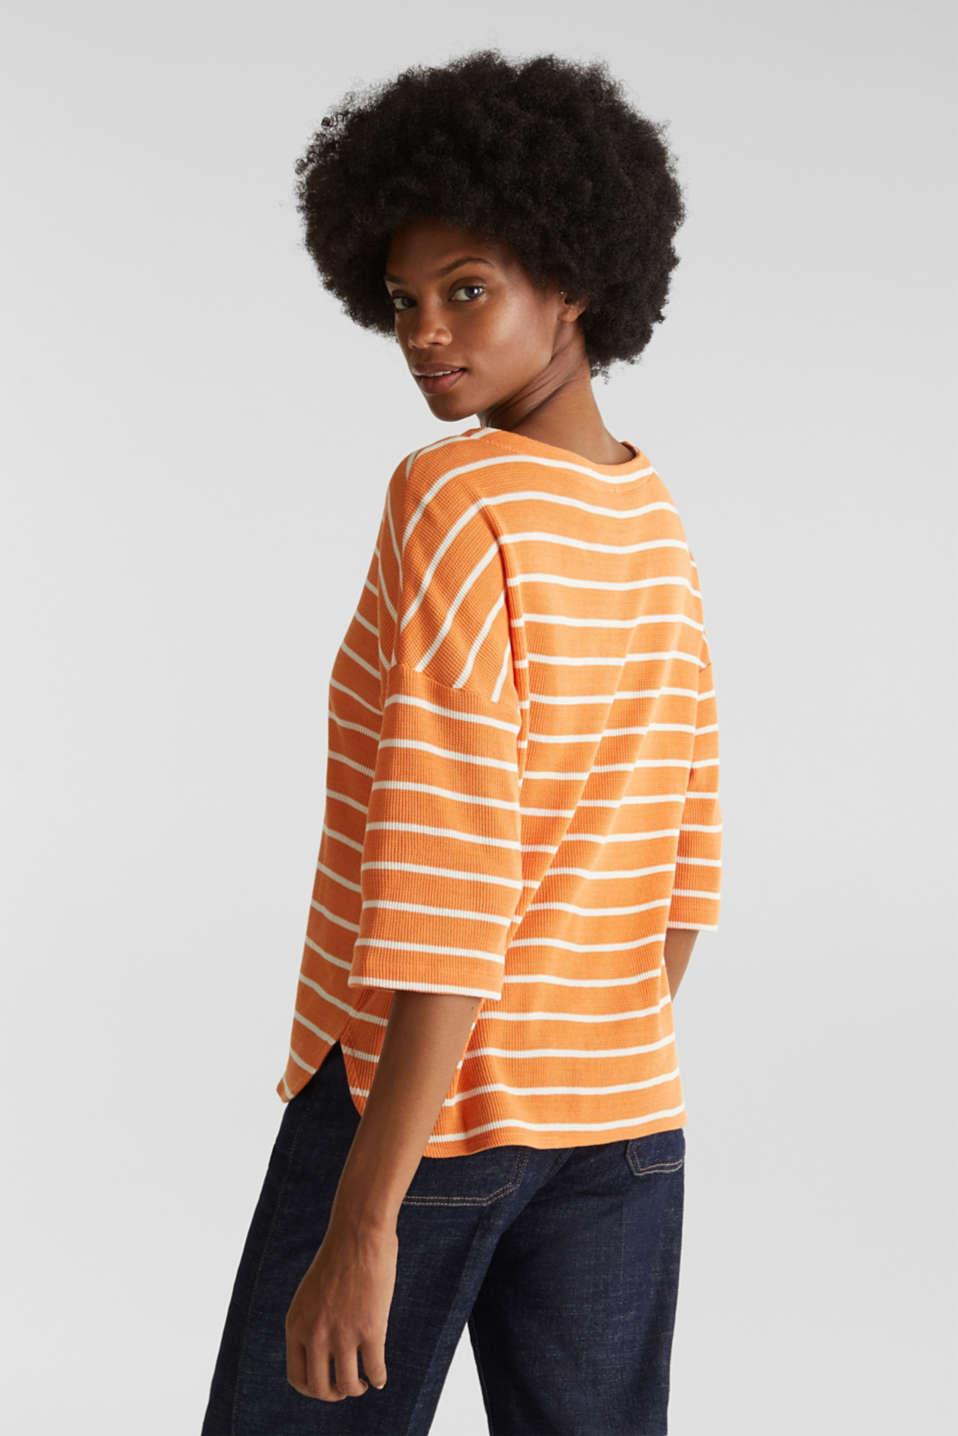 Piqué T-shirt in 100% cotton, RUST ORANGE, detail image number 3